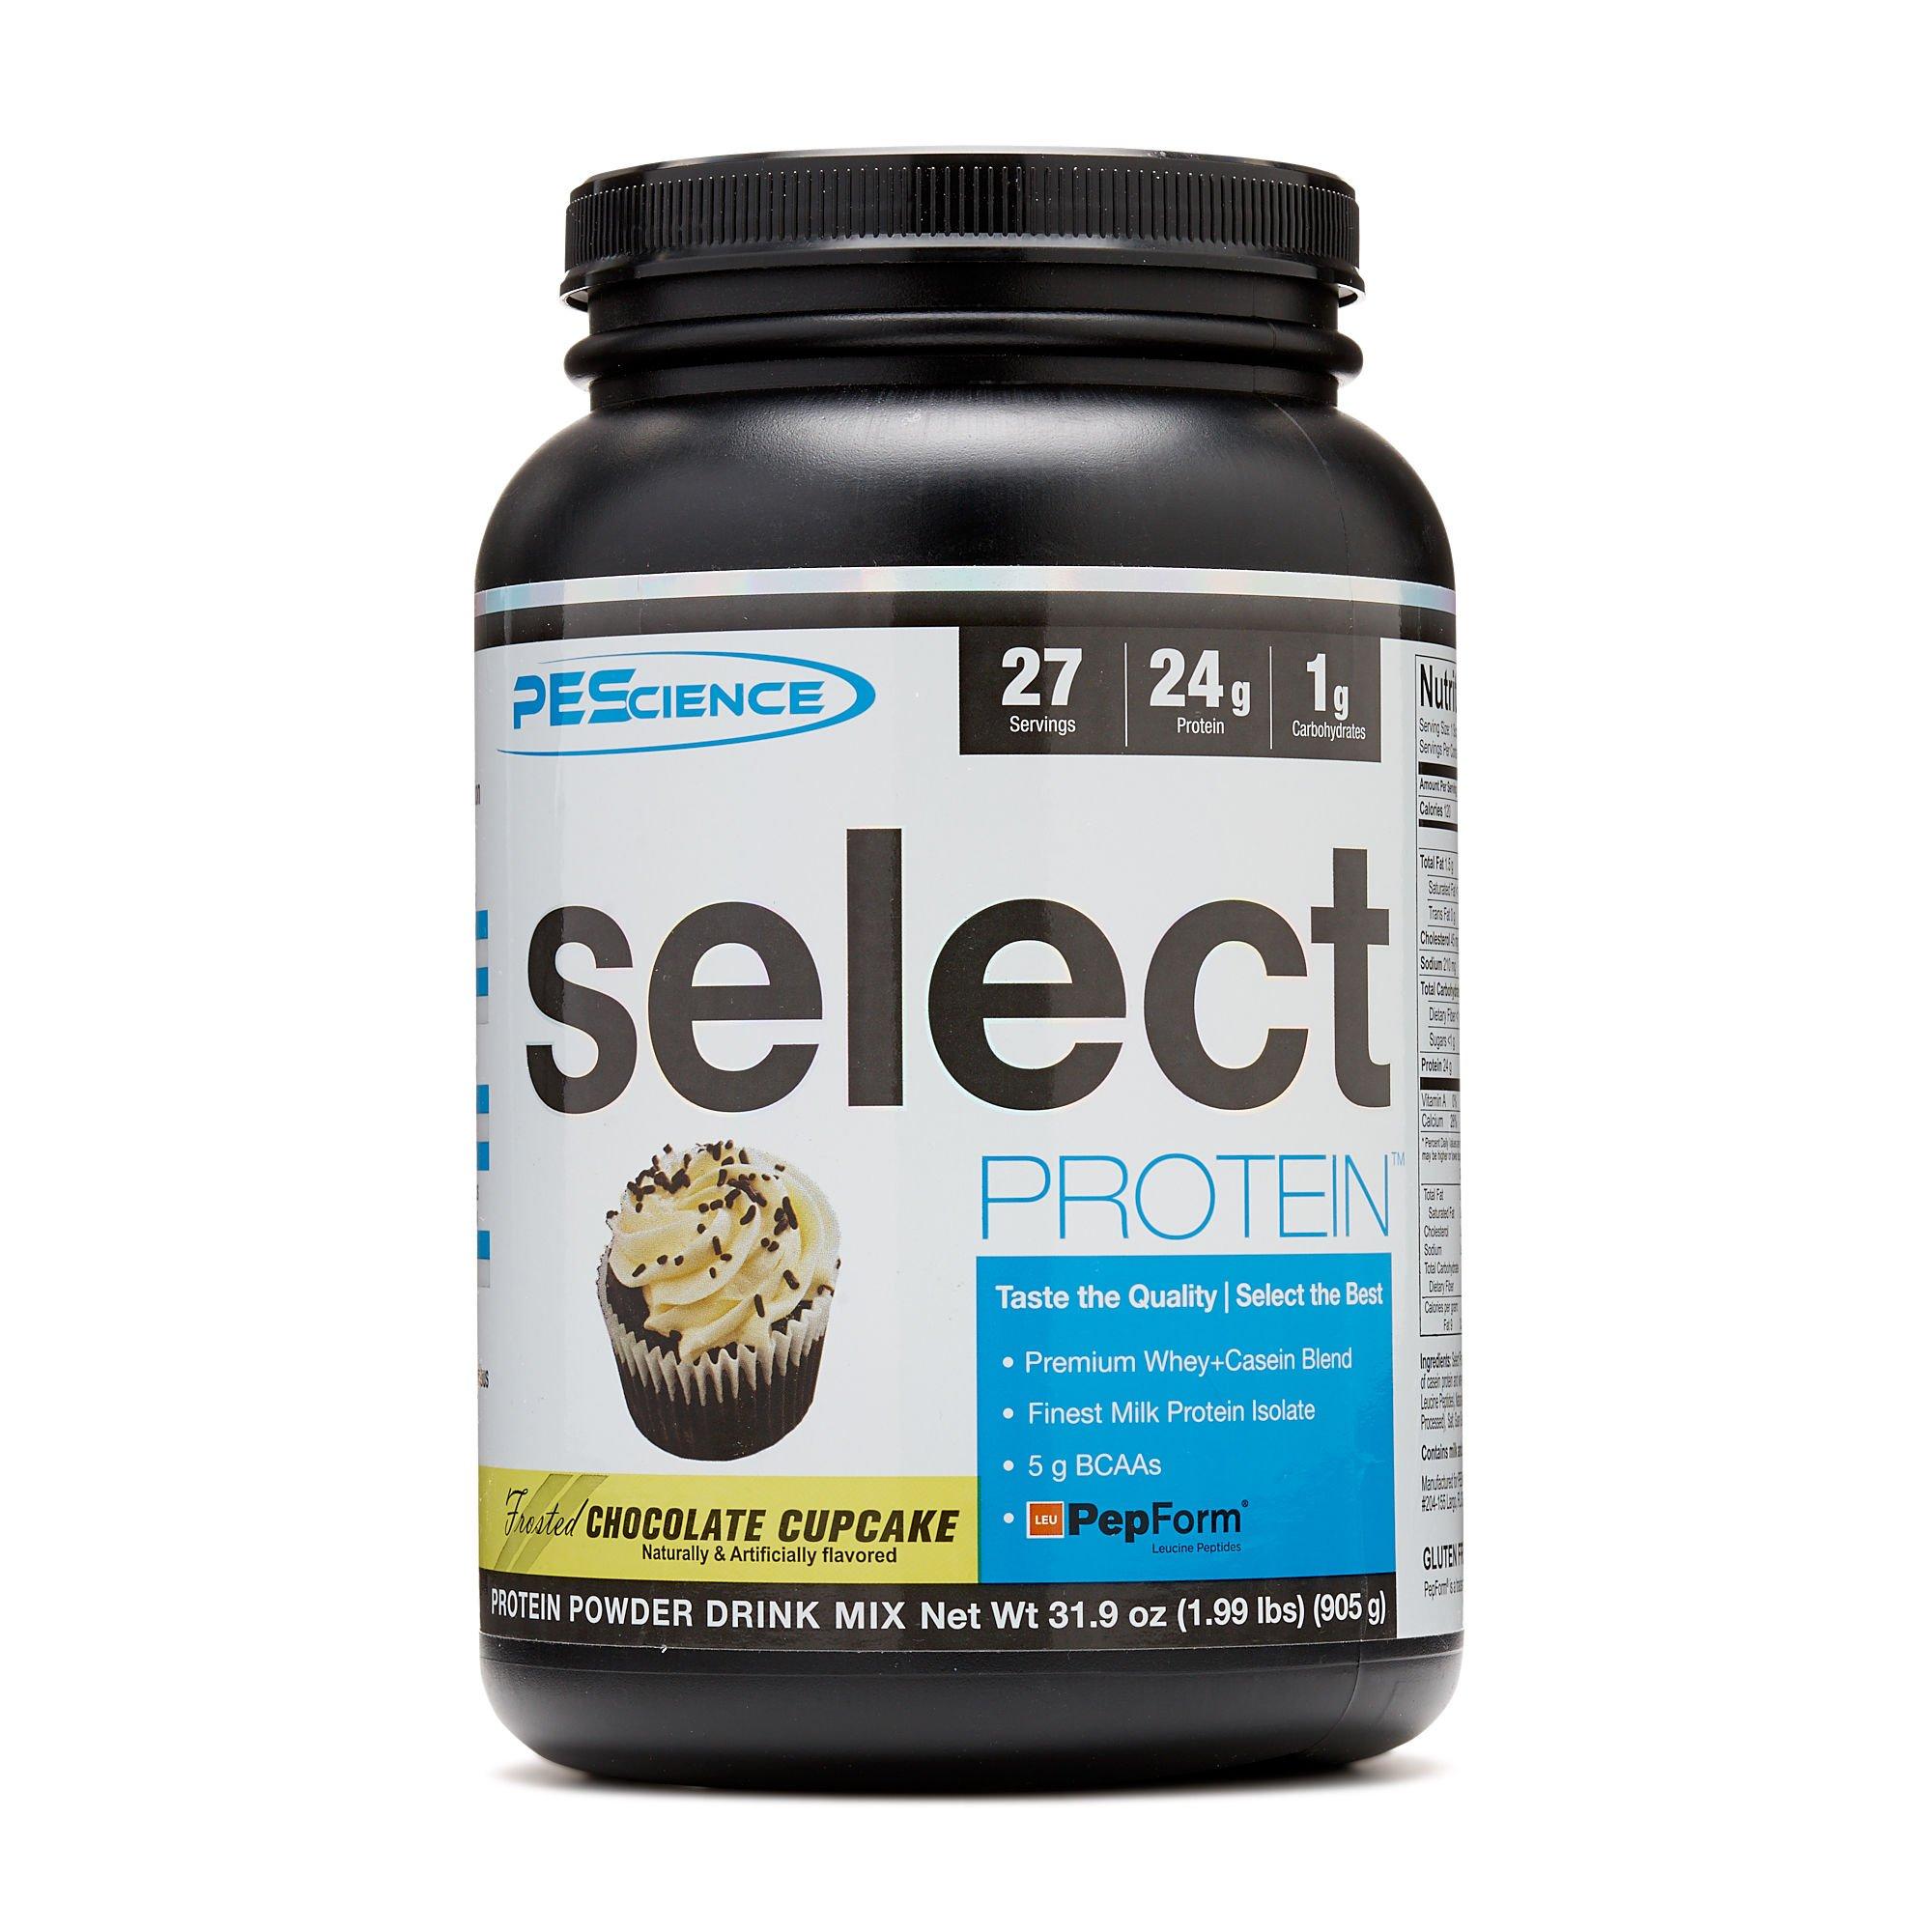 Amazon.com: PEScience - Select Protein - Whey & Casein Protein ...